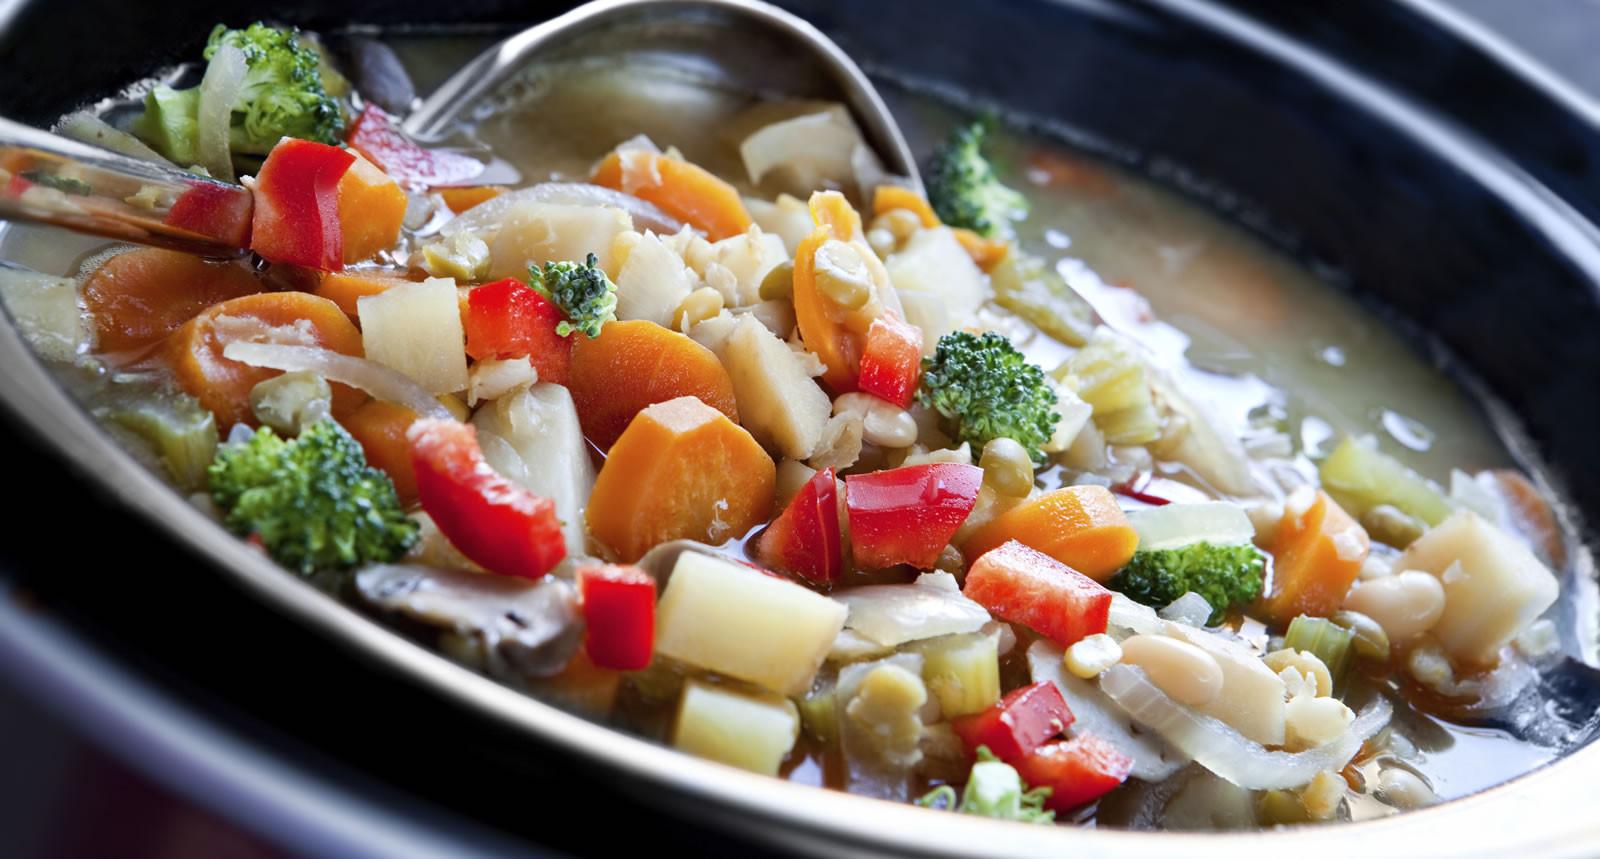 Healthy Crock Pot Dinners  3 Healthy Crockpot Recipes Pritikin Weight Loss Resort